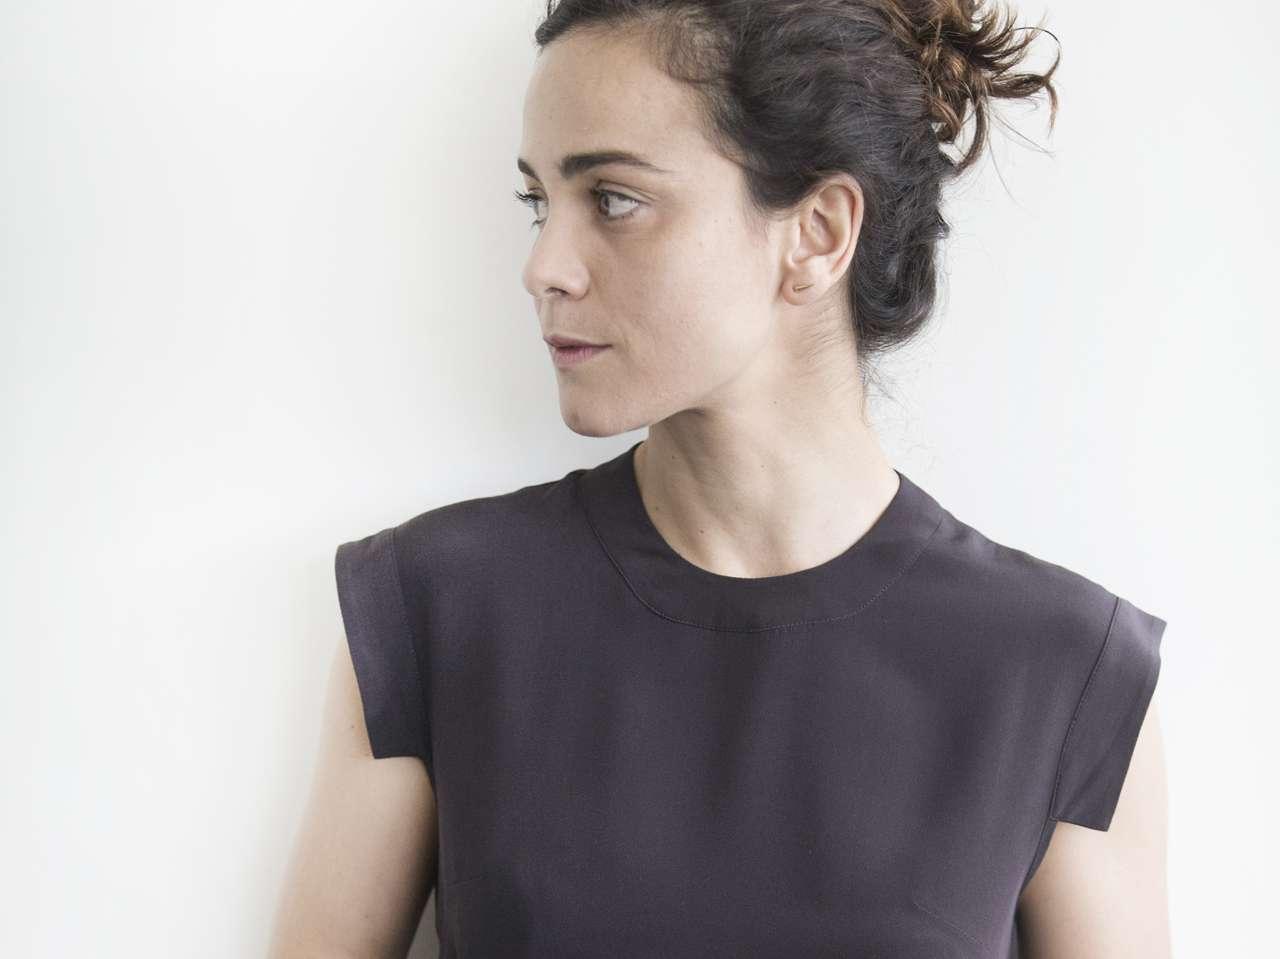 Alice Braga será 'Teresa Mendoza', personaje que hizo Kate del Castillo en teleserie de Telemundo. Foto: Getty Images